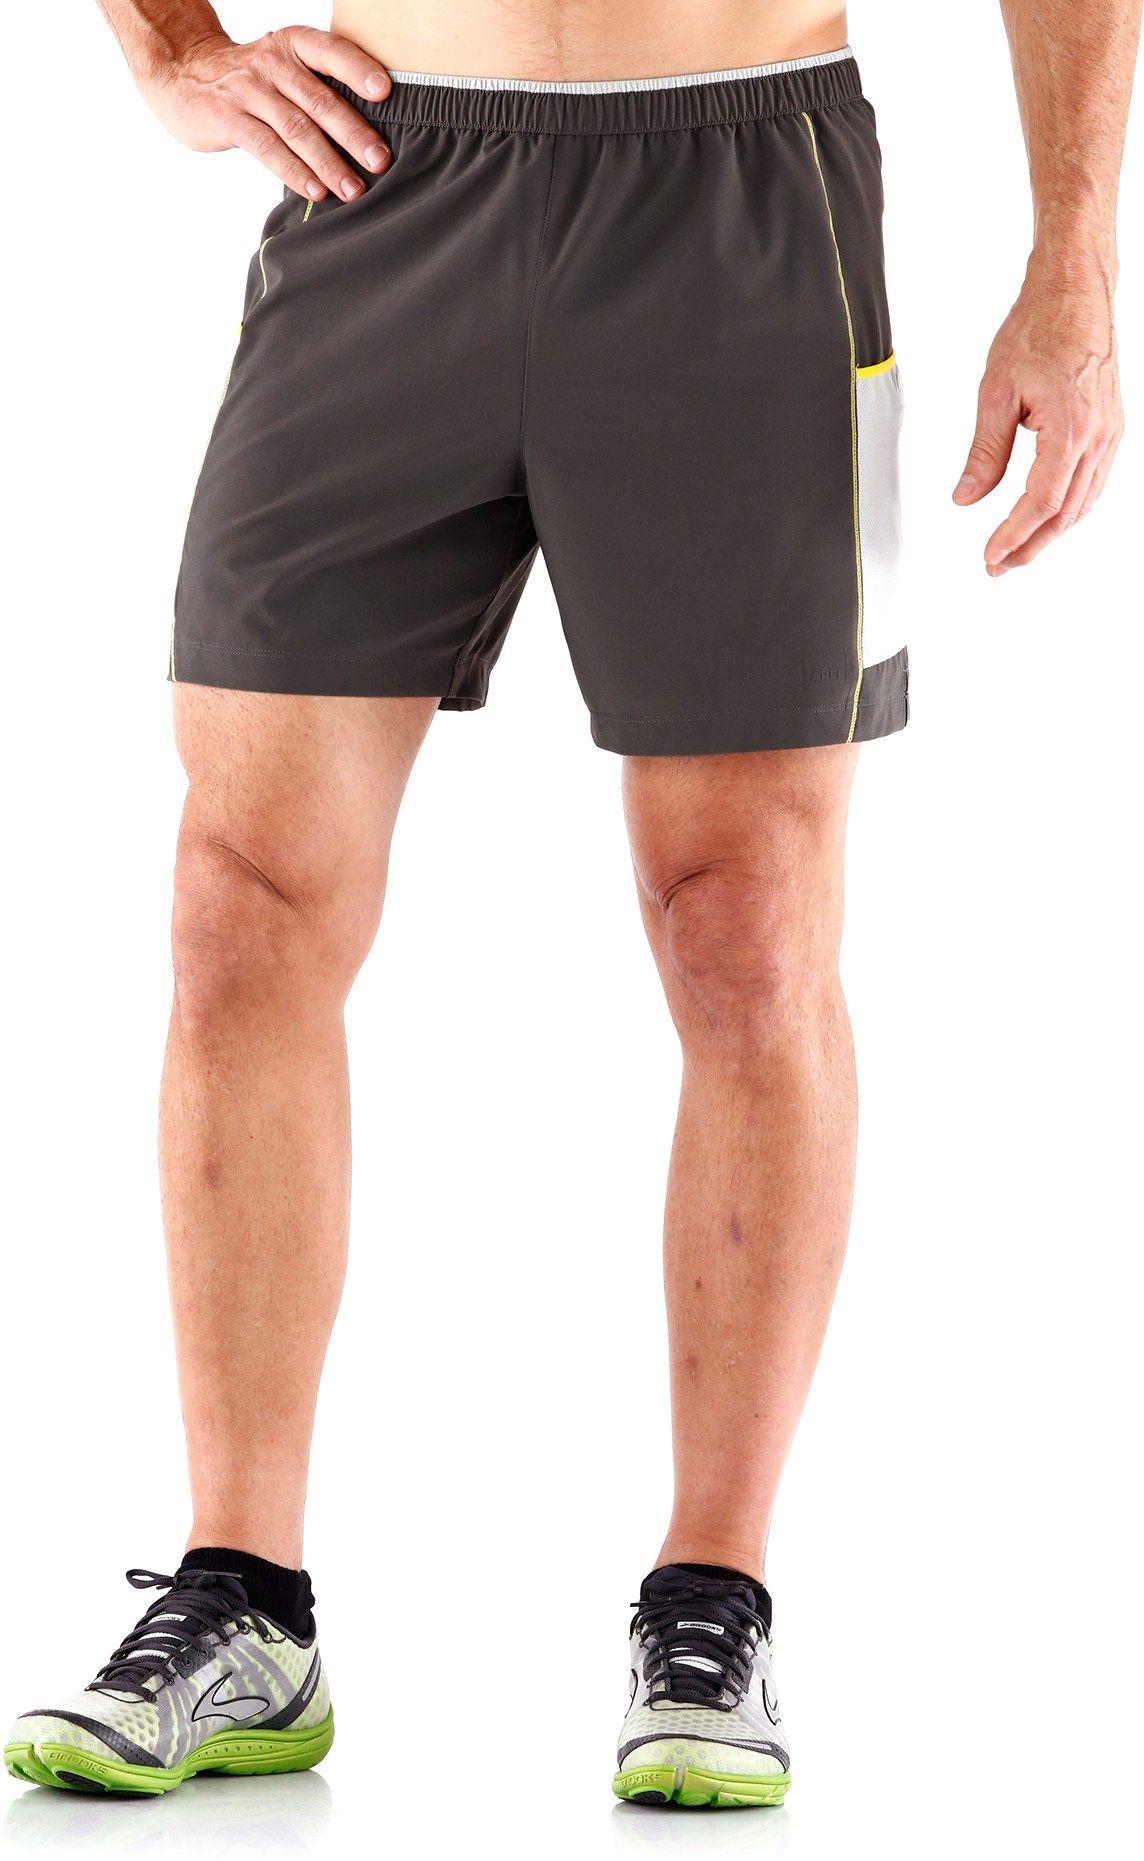 6 inseam men's shorts